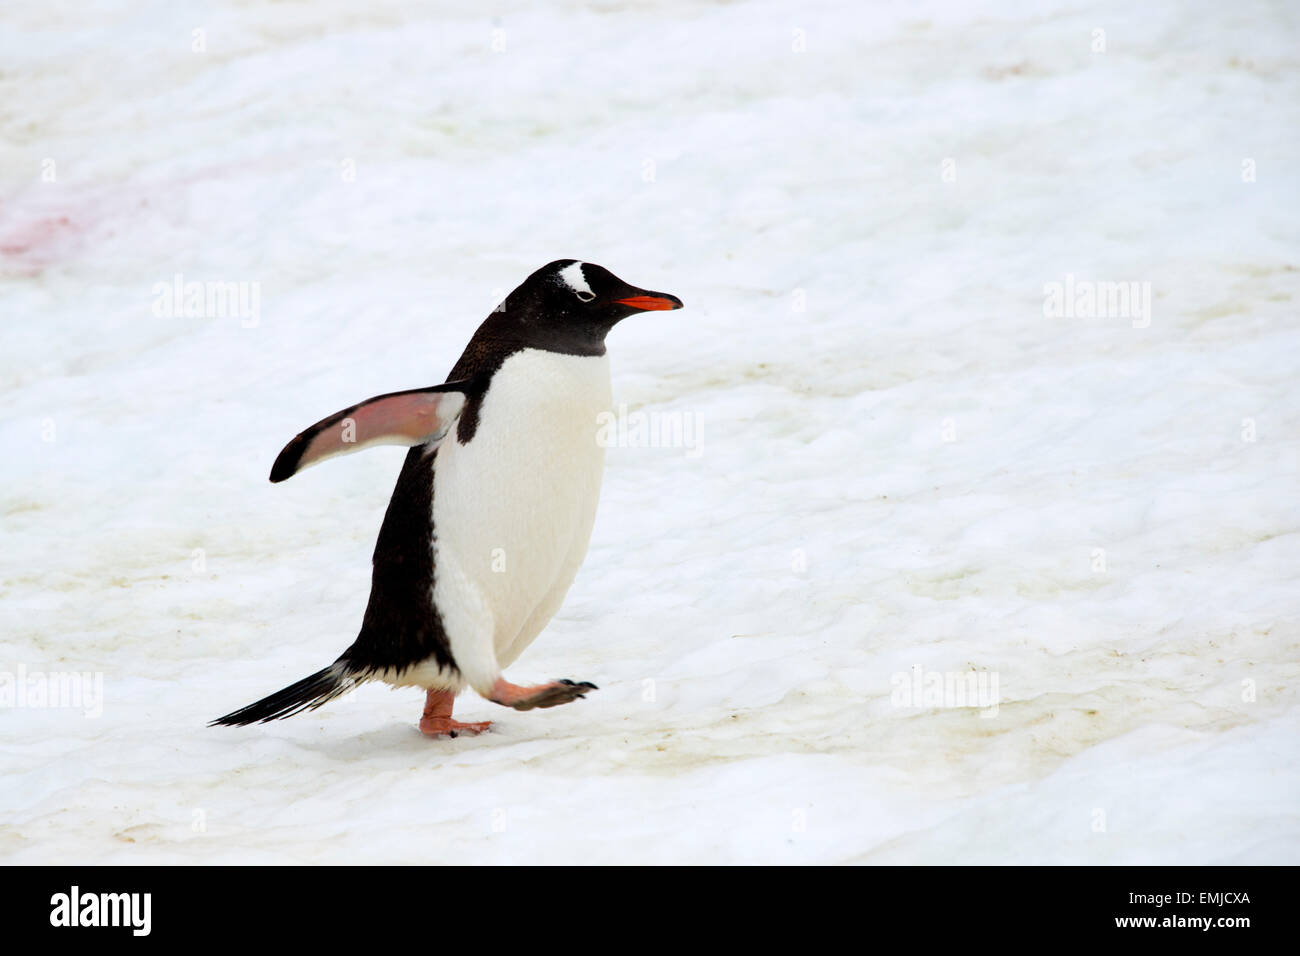 Gentoo penguin returning from sea walking up penguin track Peterman island Antarctic Peninsular Antartica - Stock Image